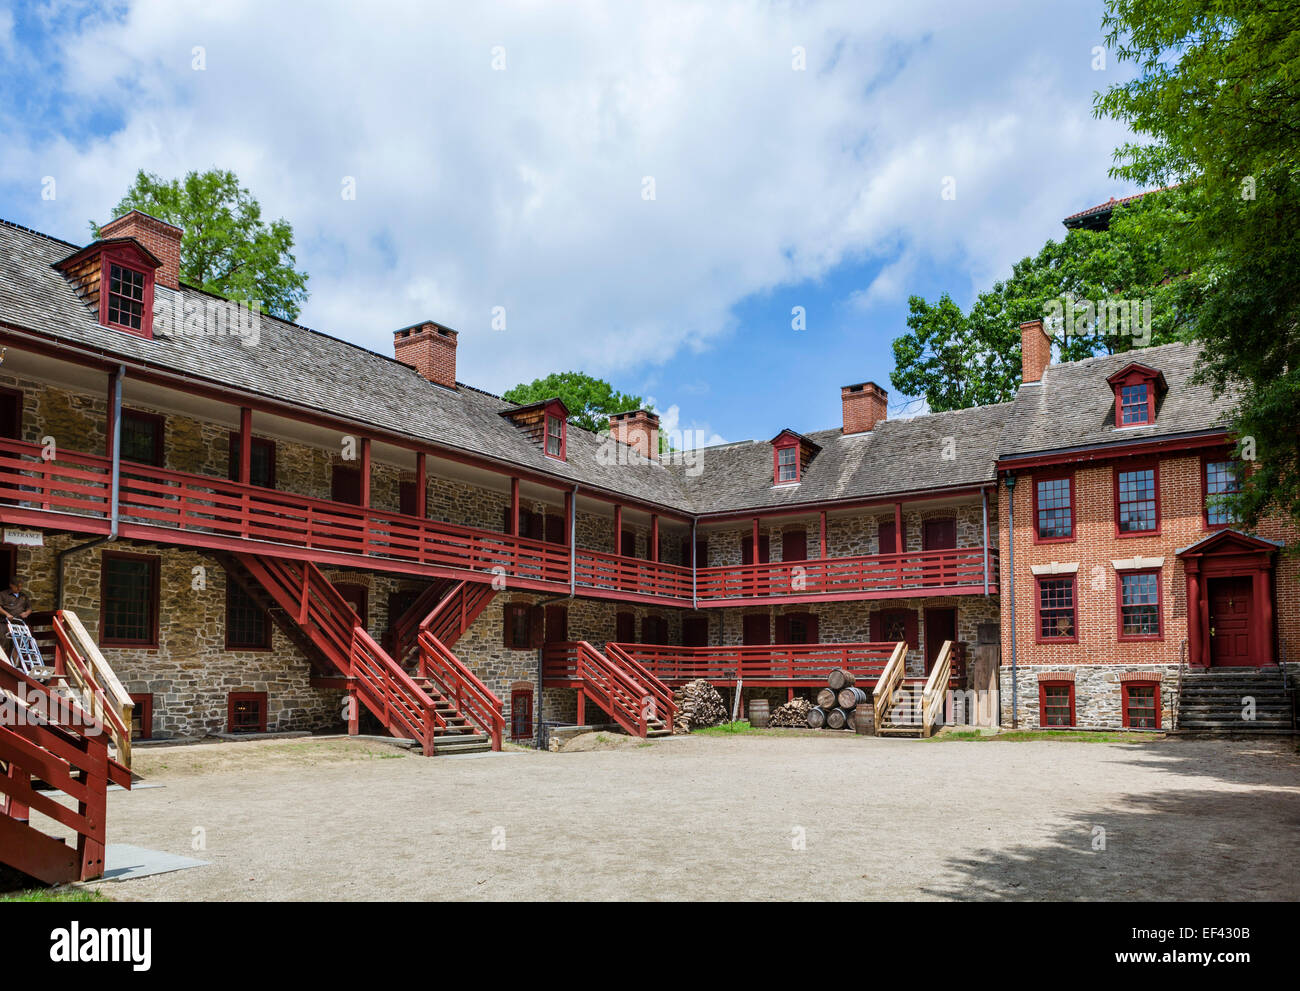 The Old Barracks Museum, Trenton, New Jersey, USA - Stock Image